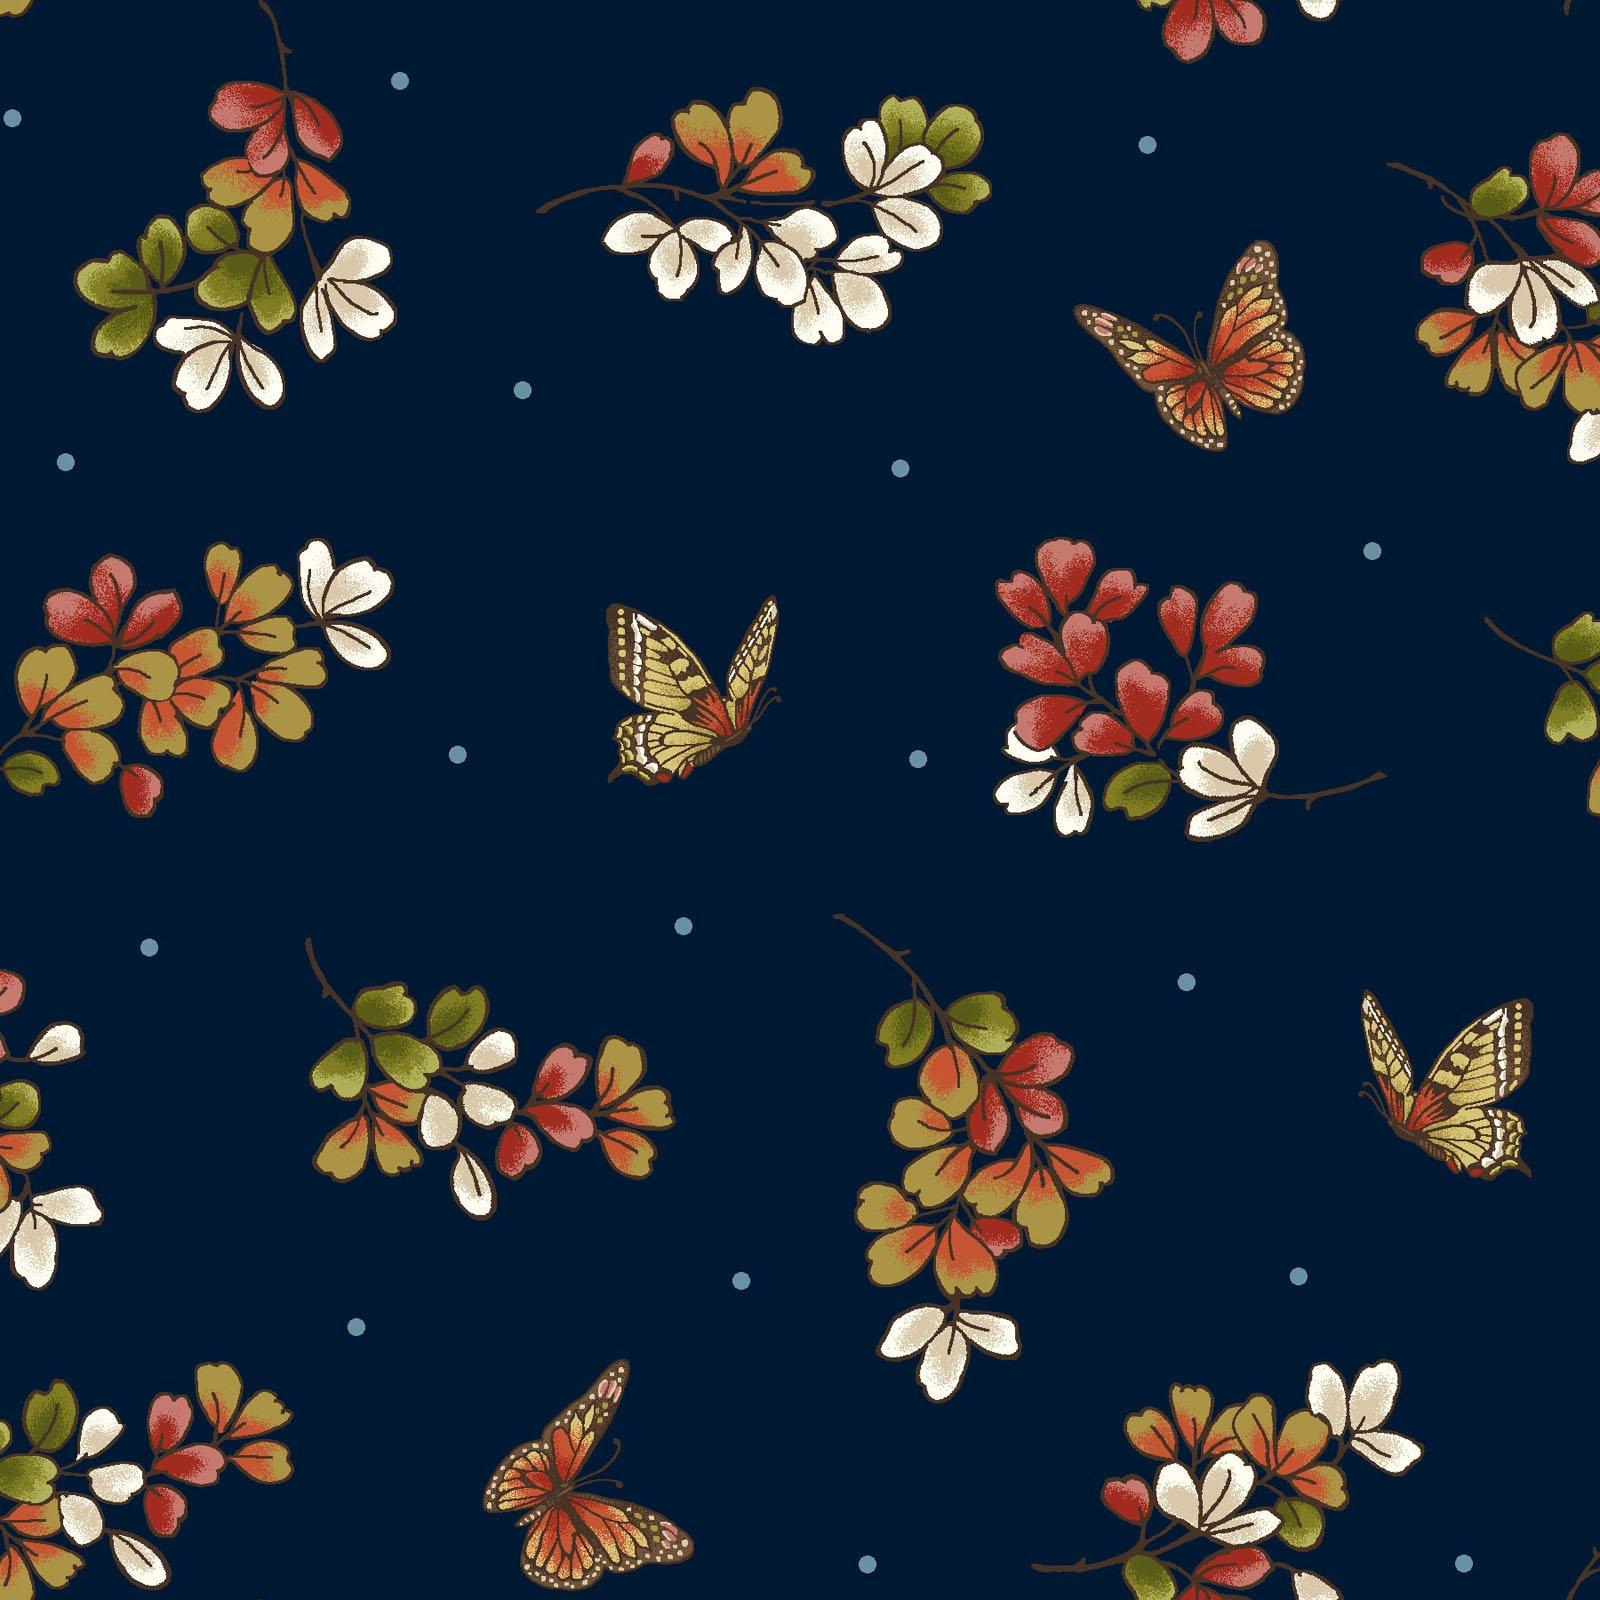 Japanese Garden - Butterfly Indigo<br/>Maywood Studio 8085-N